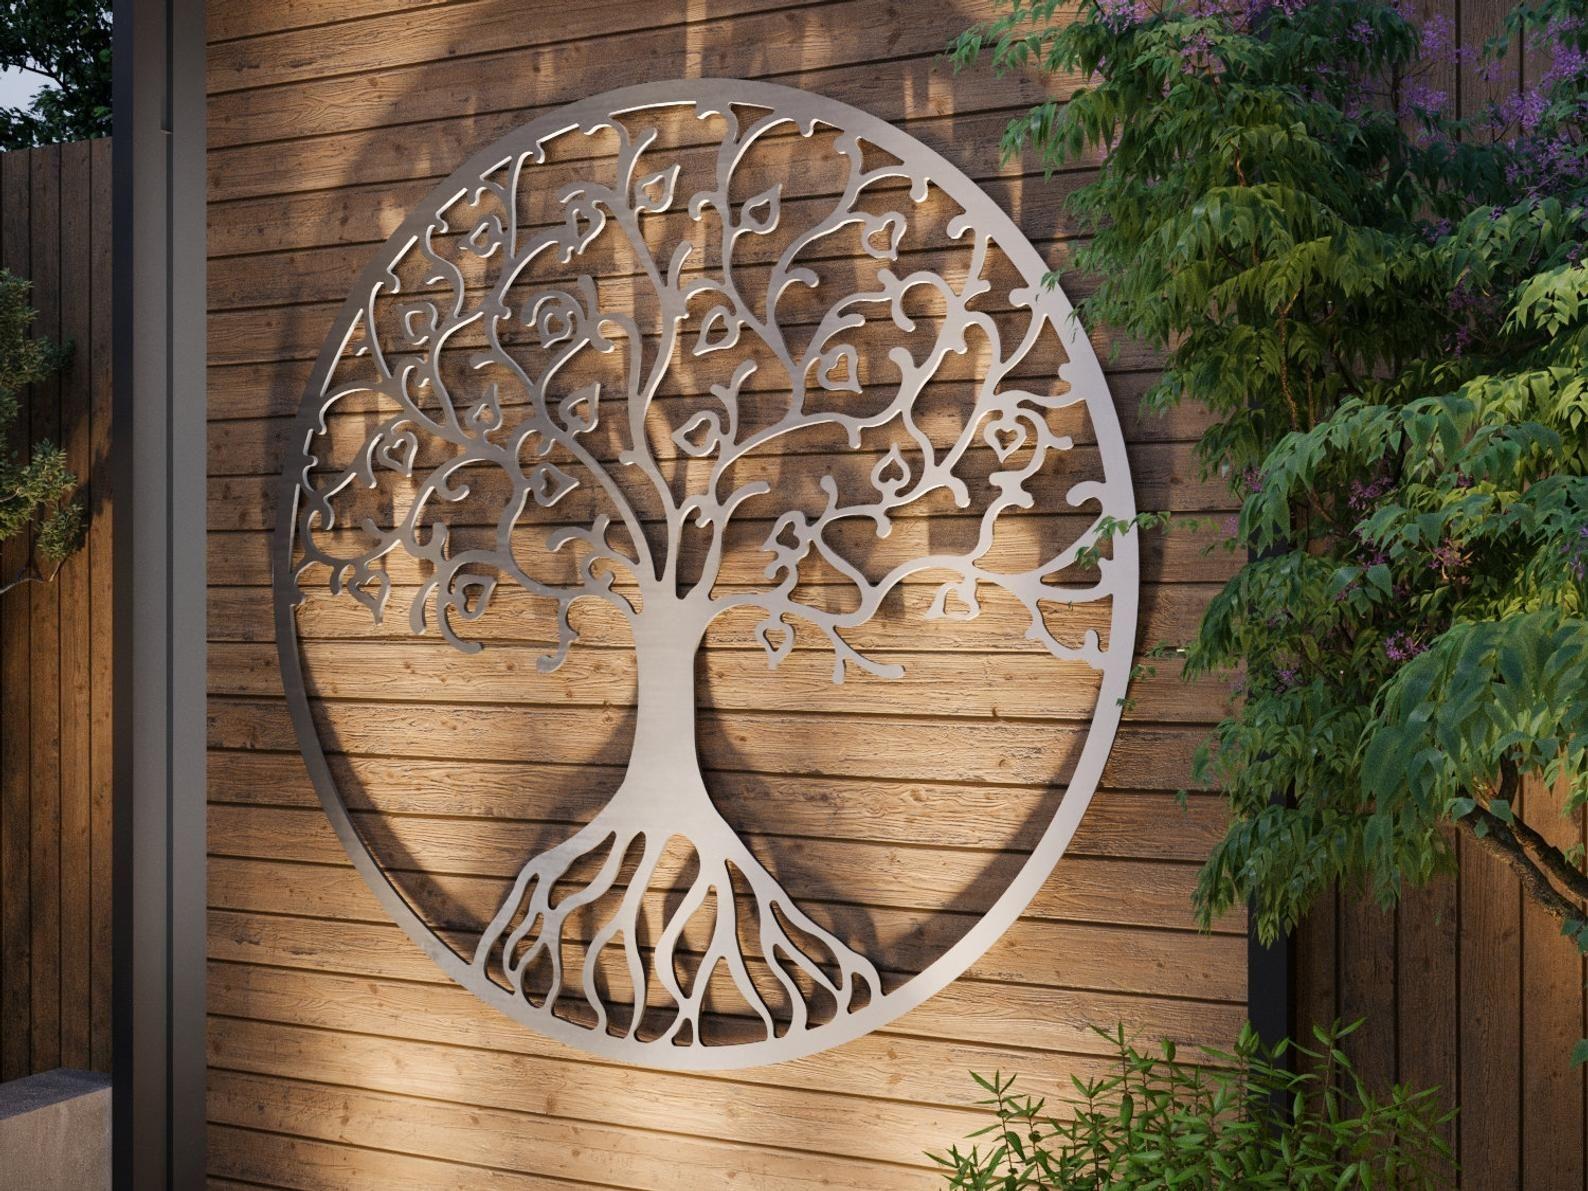 Tree of Life Outdoor Metal Wall Art, Large Metal Tree Wall ...